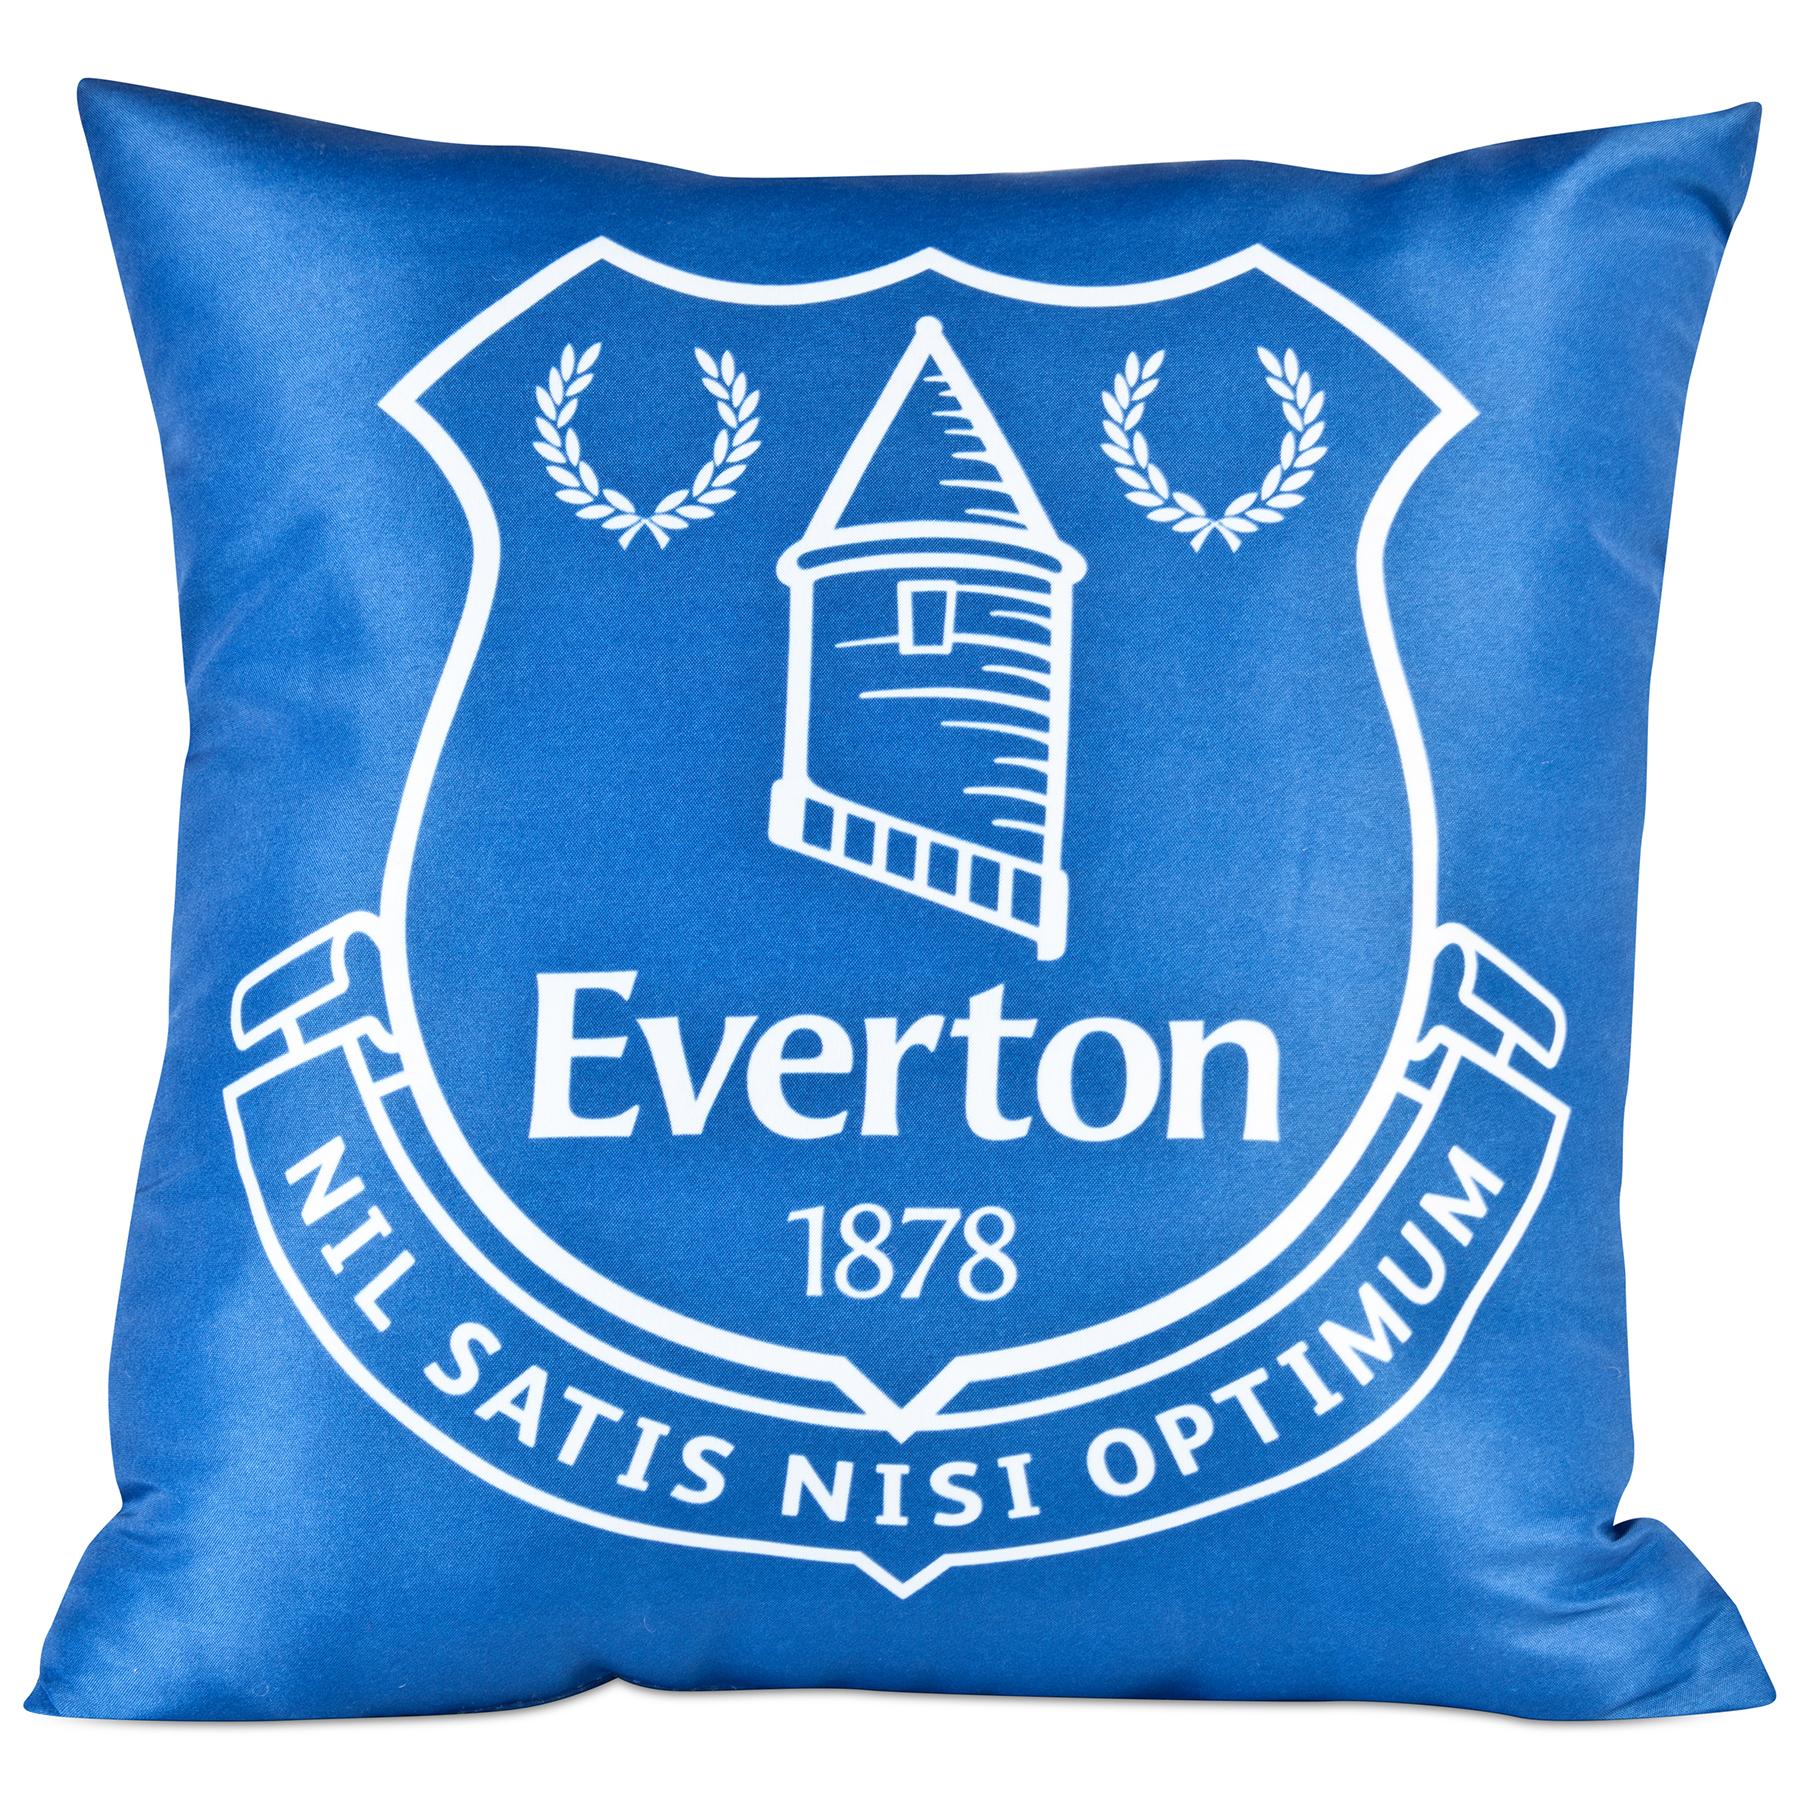 Image of Everton Crest Cushion 35cm